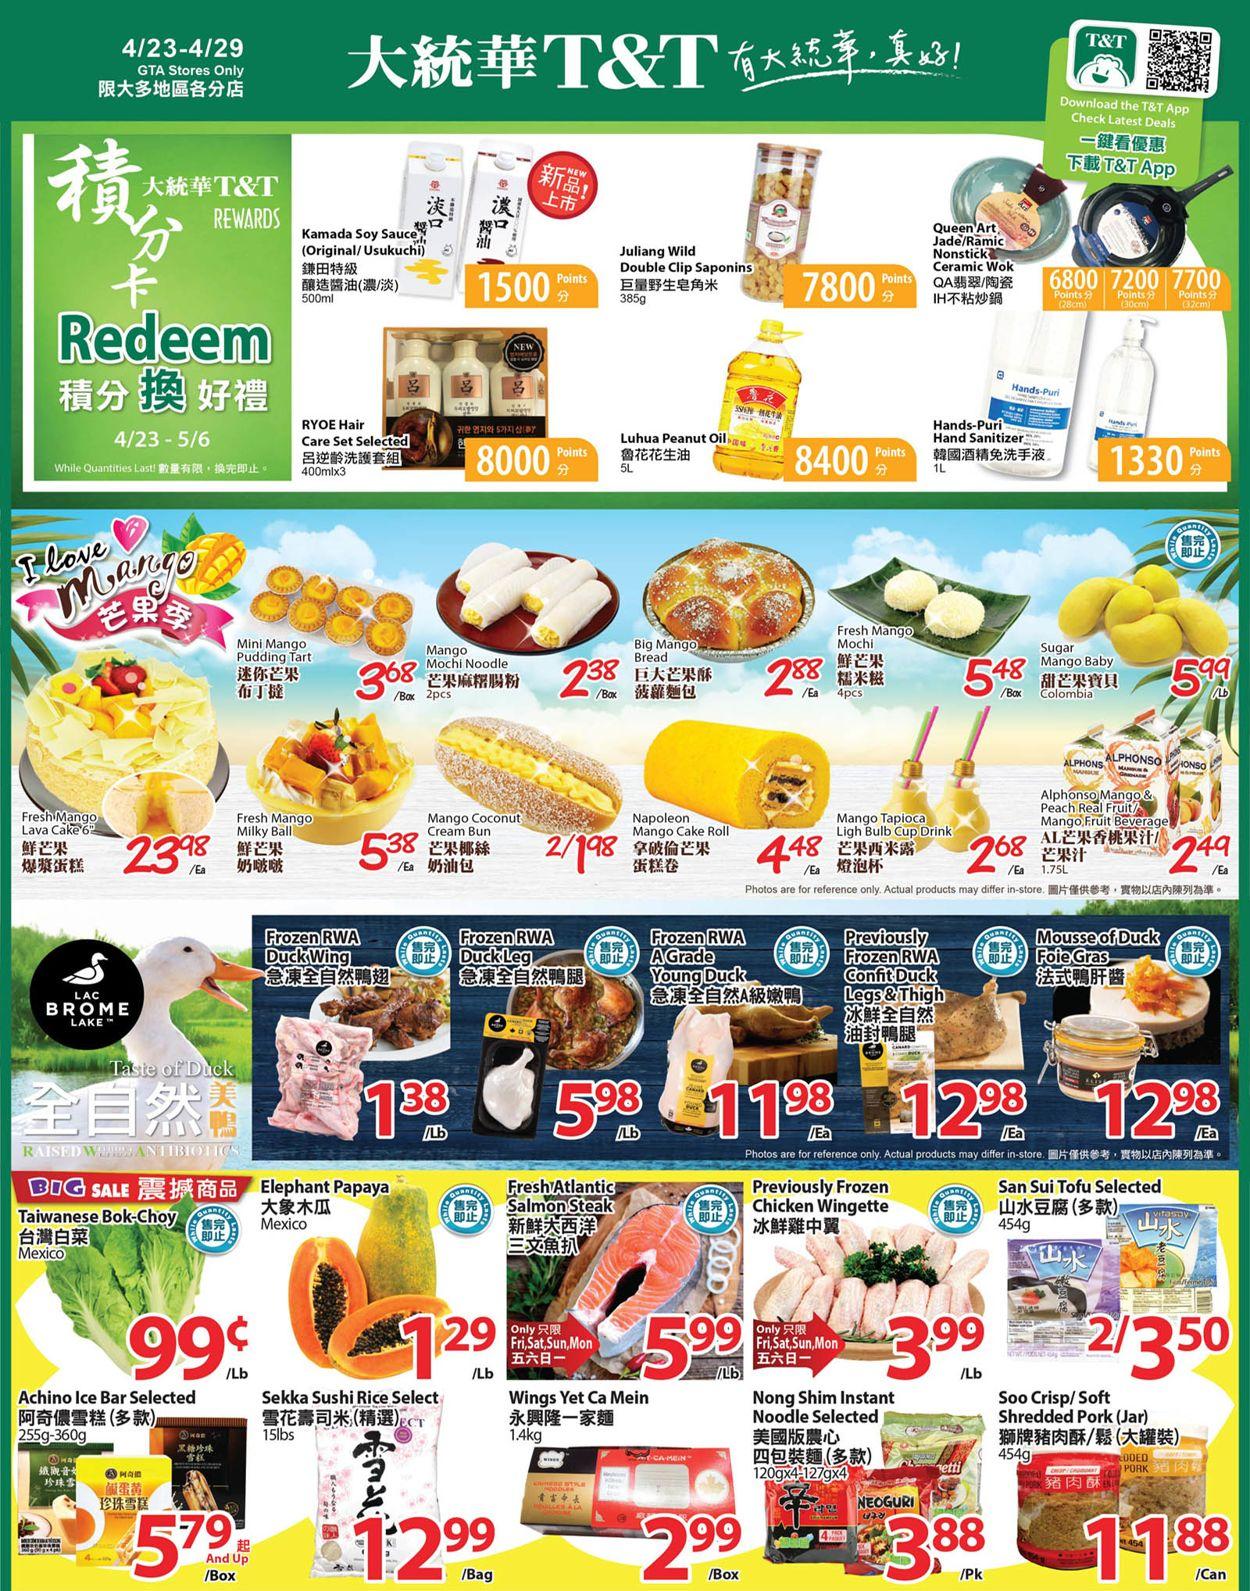 T&T Supermarket - Greater Toronto Area Flyer - 04/23-04/29/2021